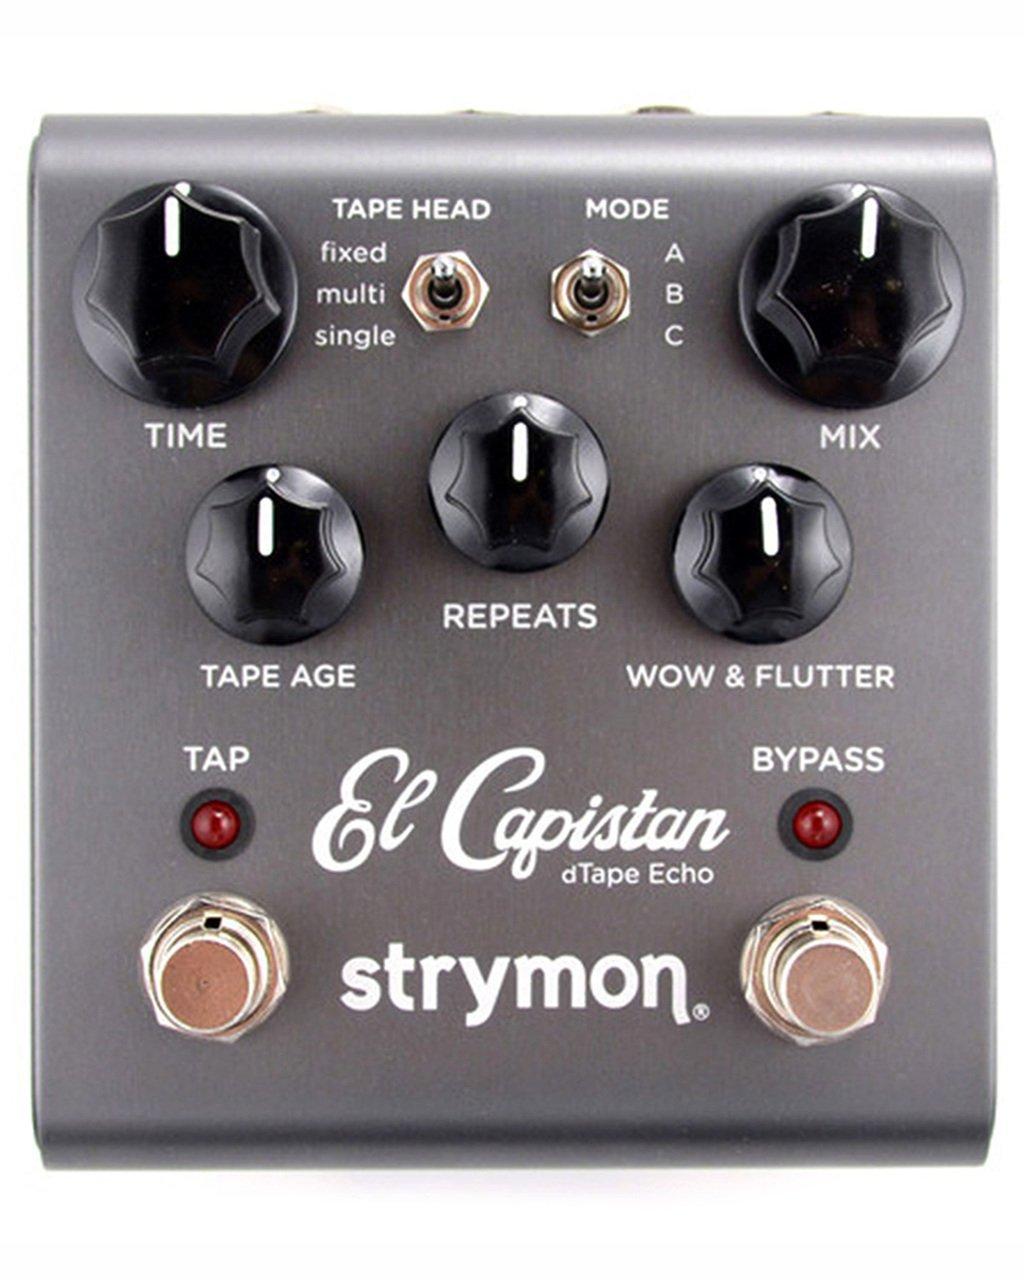 Strymon El Capistan d Tape Echo